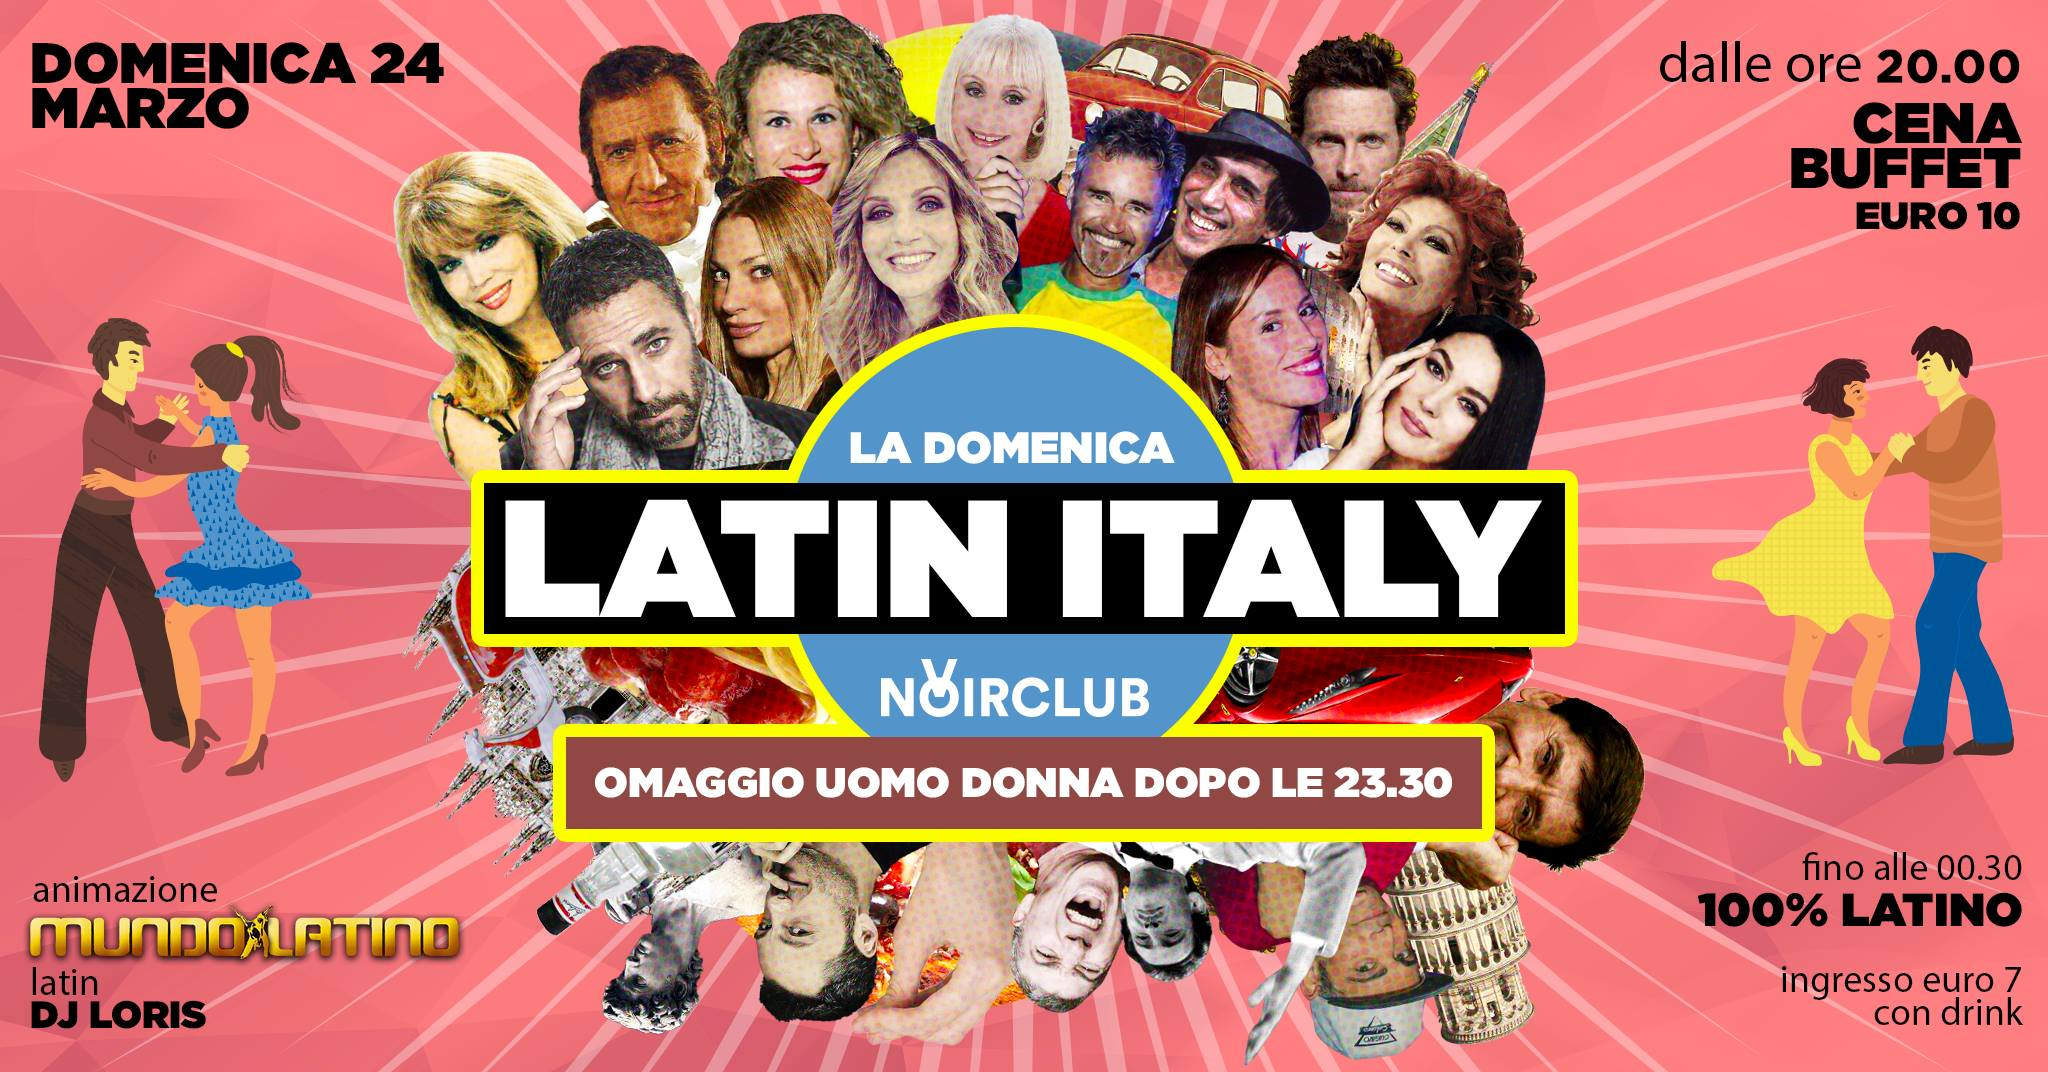 Noir Club Jesi apericena con musica latina e italiana